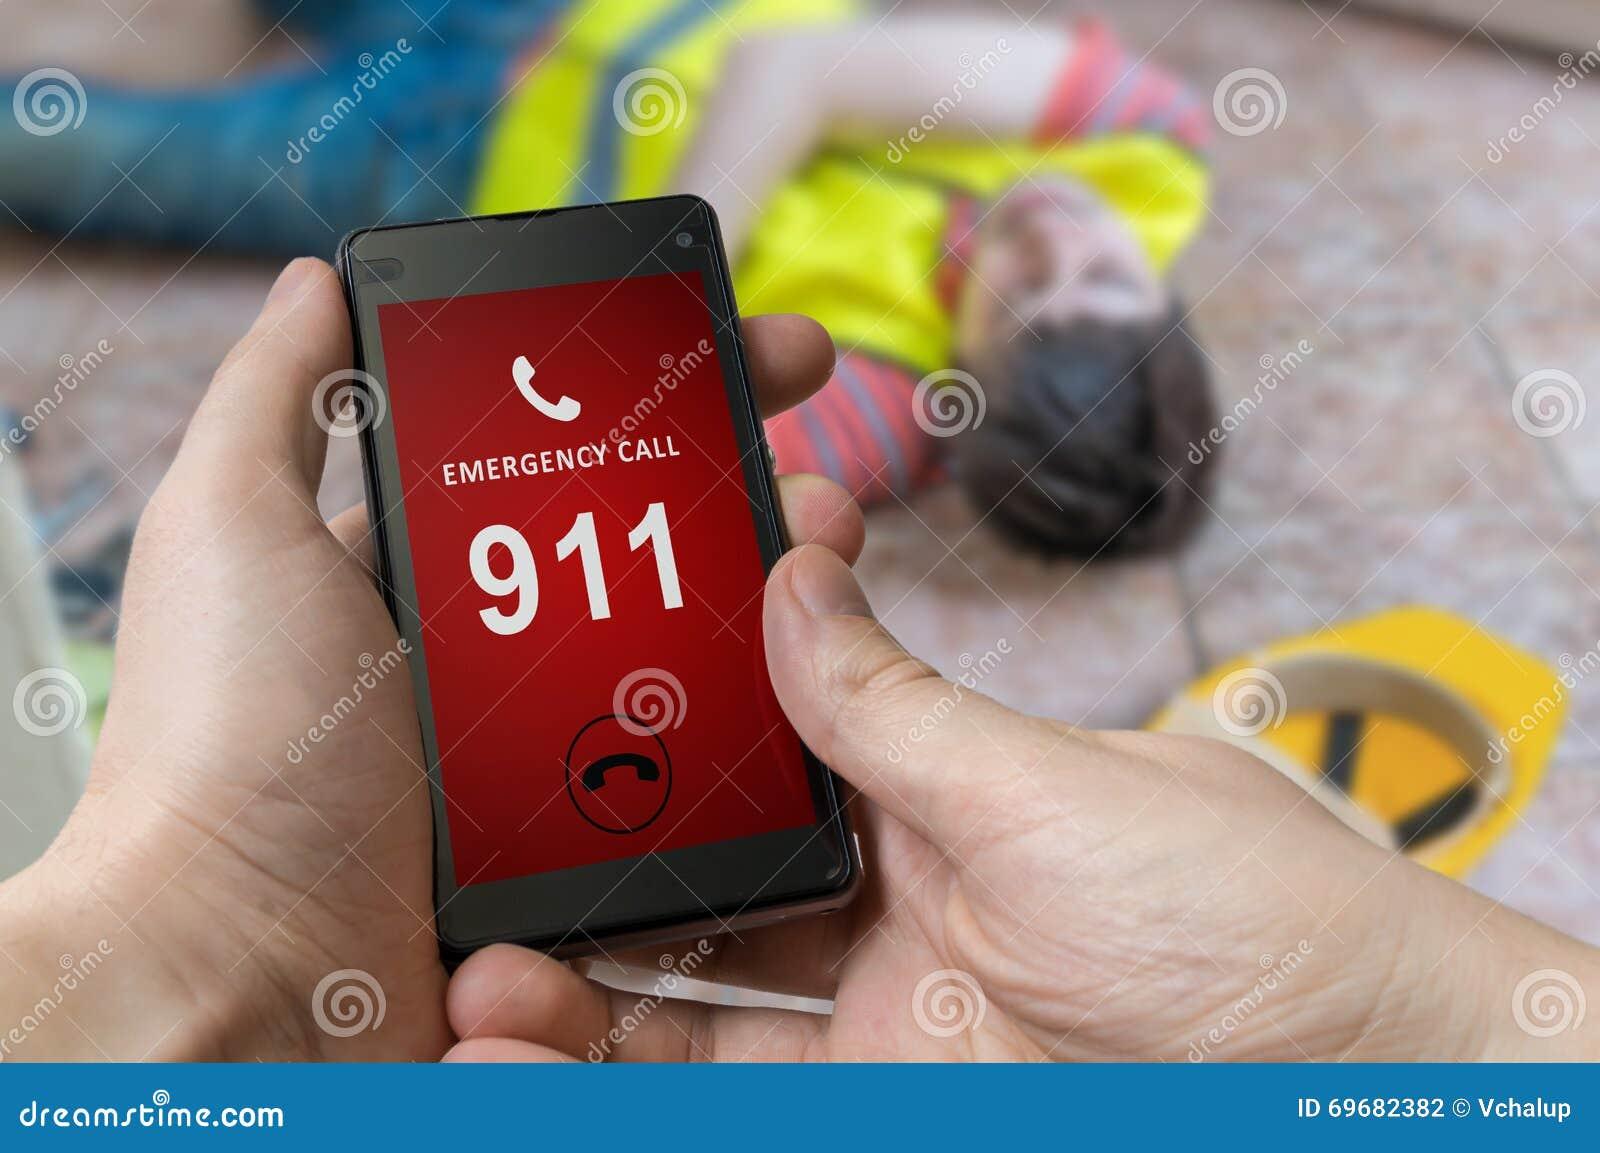 Man dialing emergency (911 number) on smartphone. Injured worker